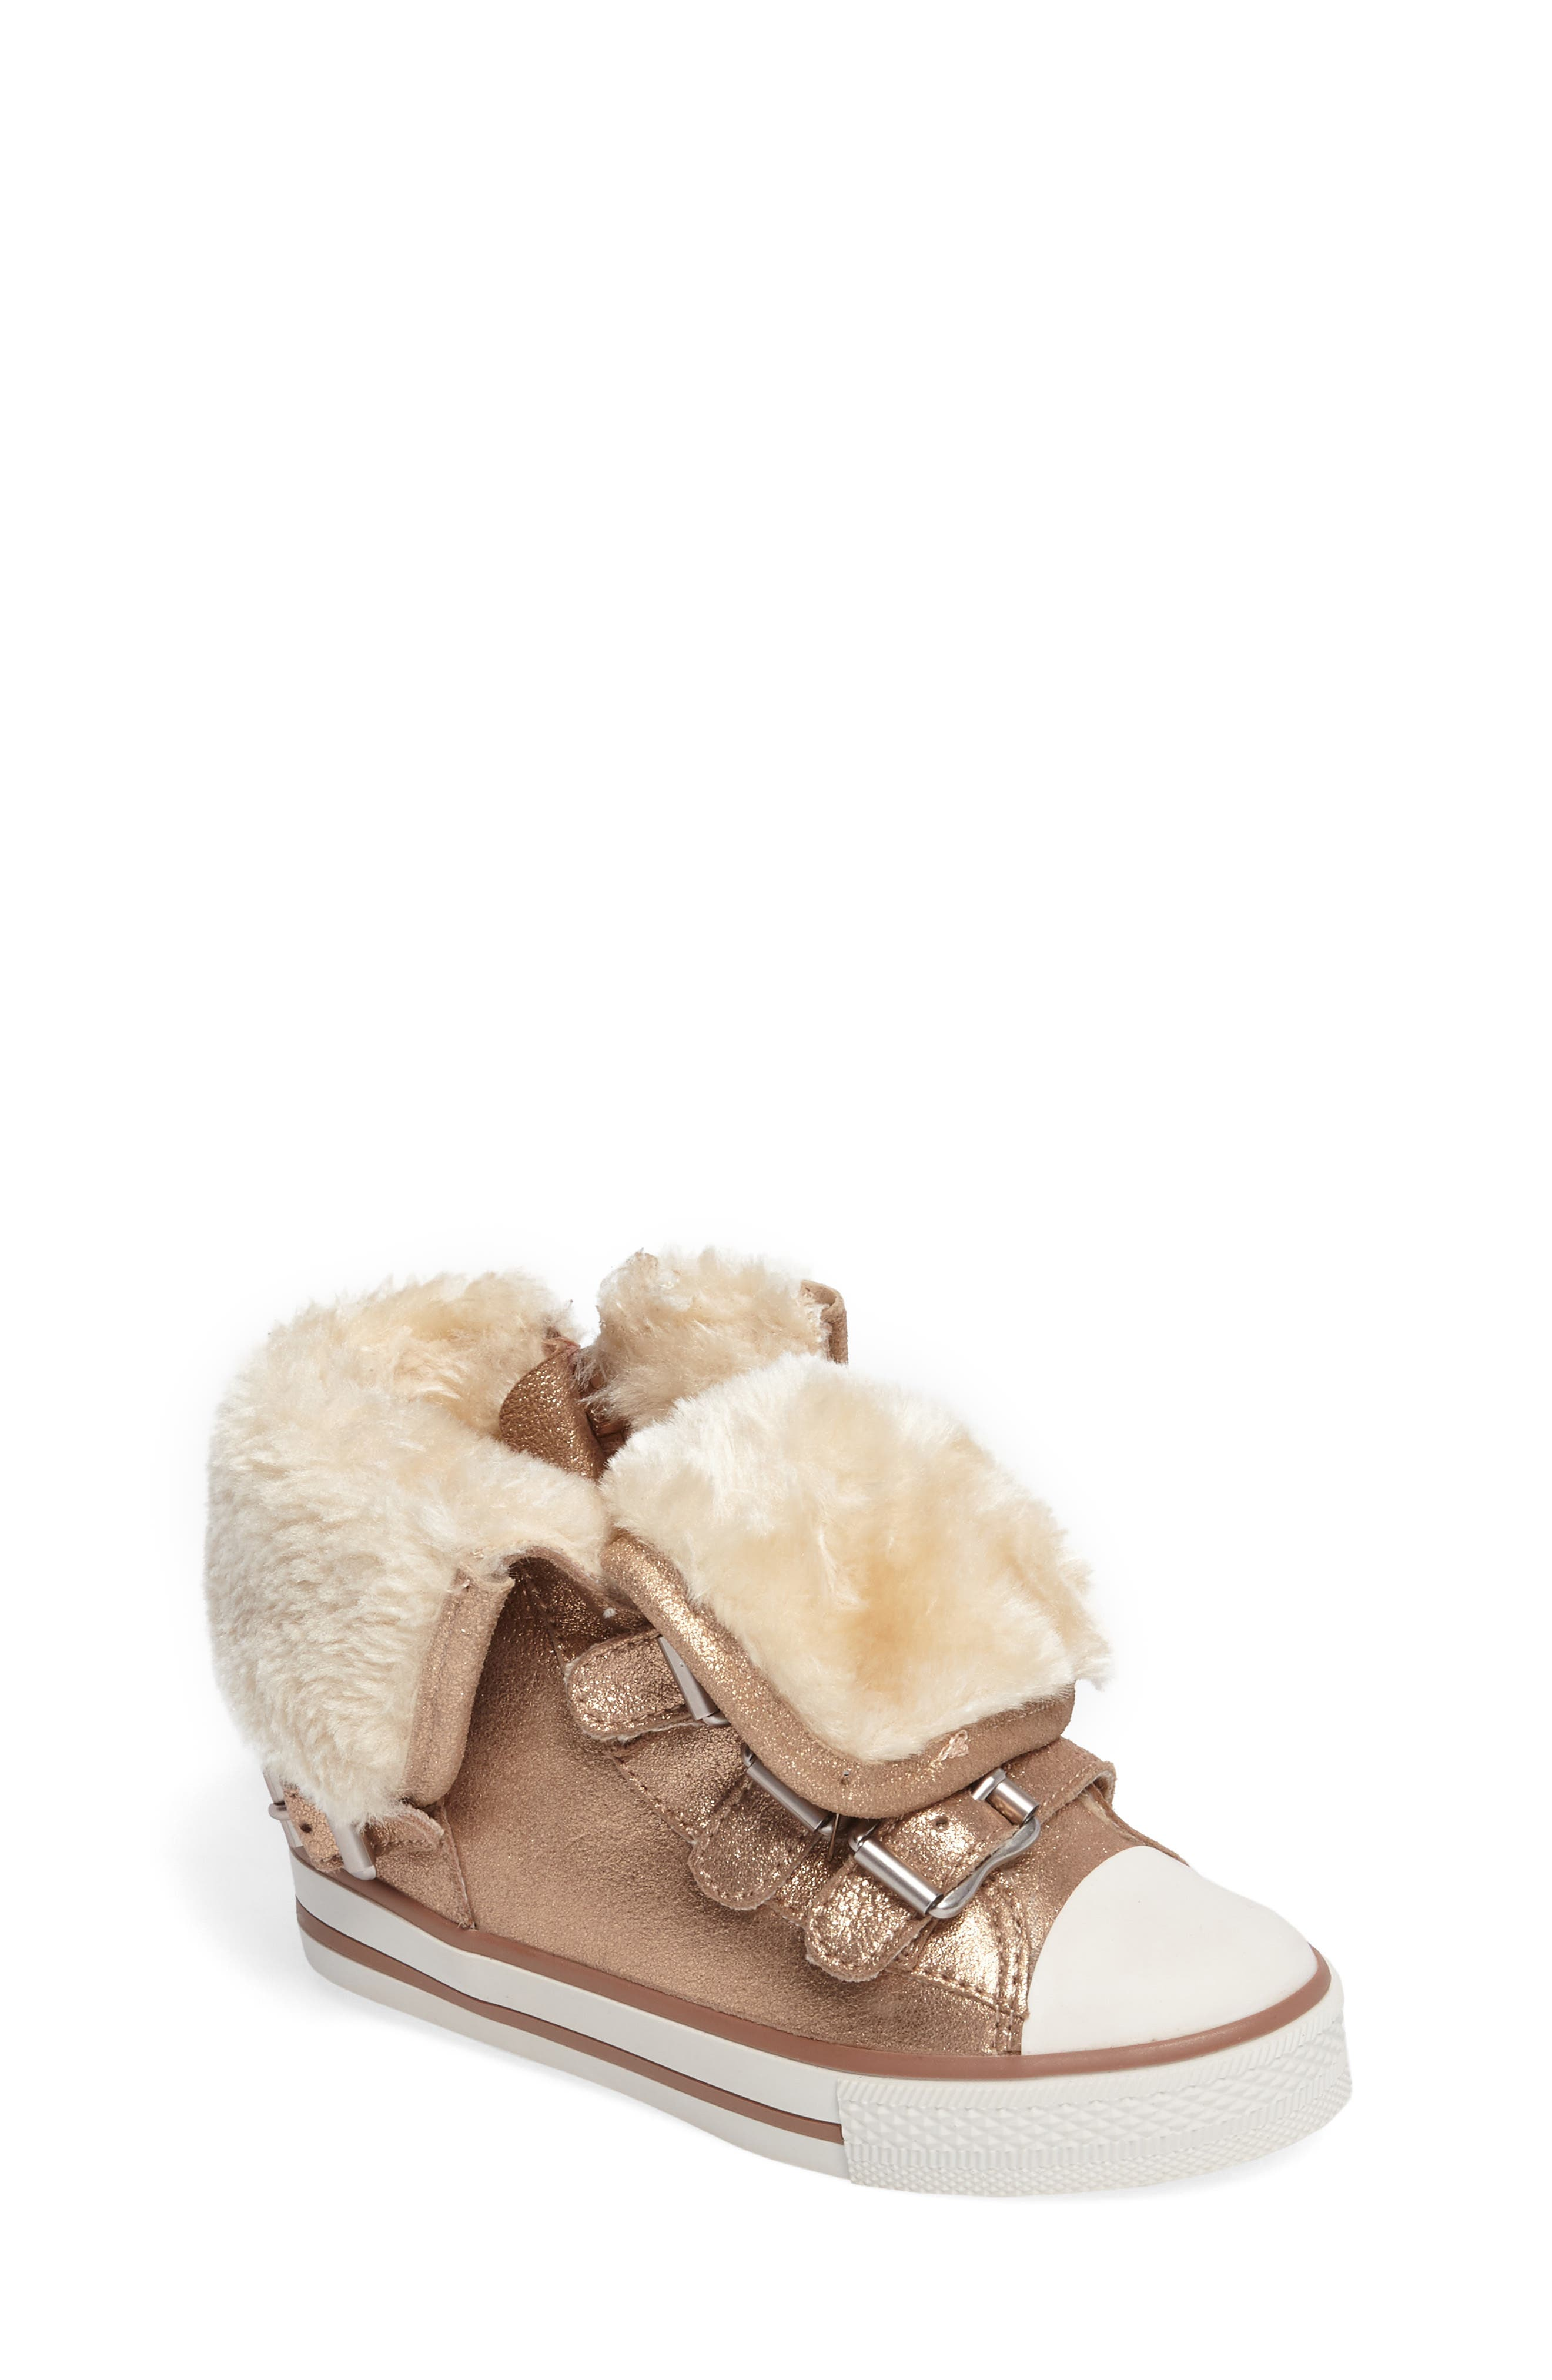 Vava Faux Fur Glitter Sneaker,                             Main thumbnail 1, color,                             Rose Gold Suede